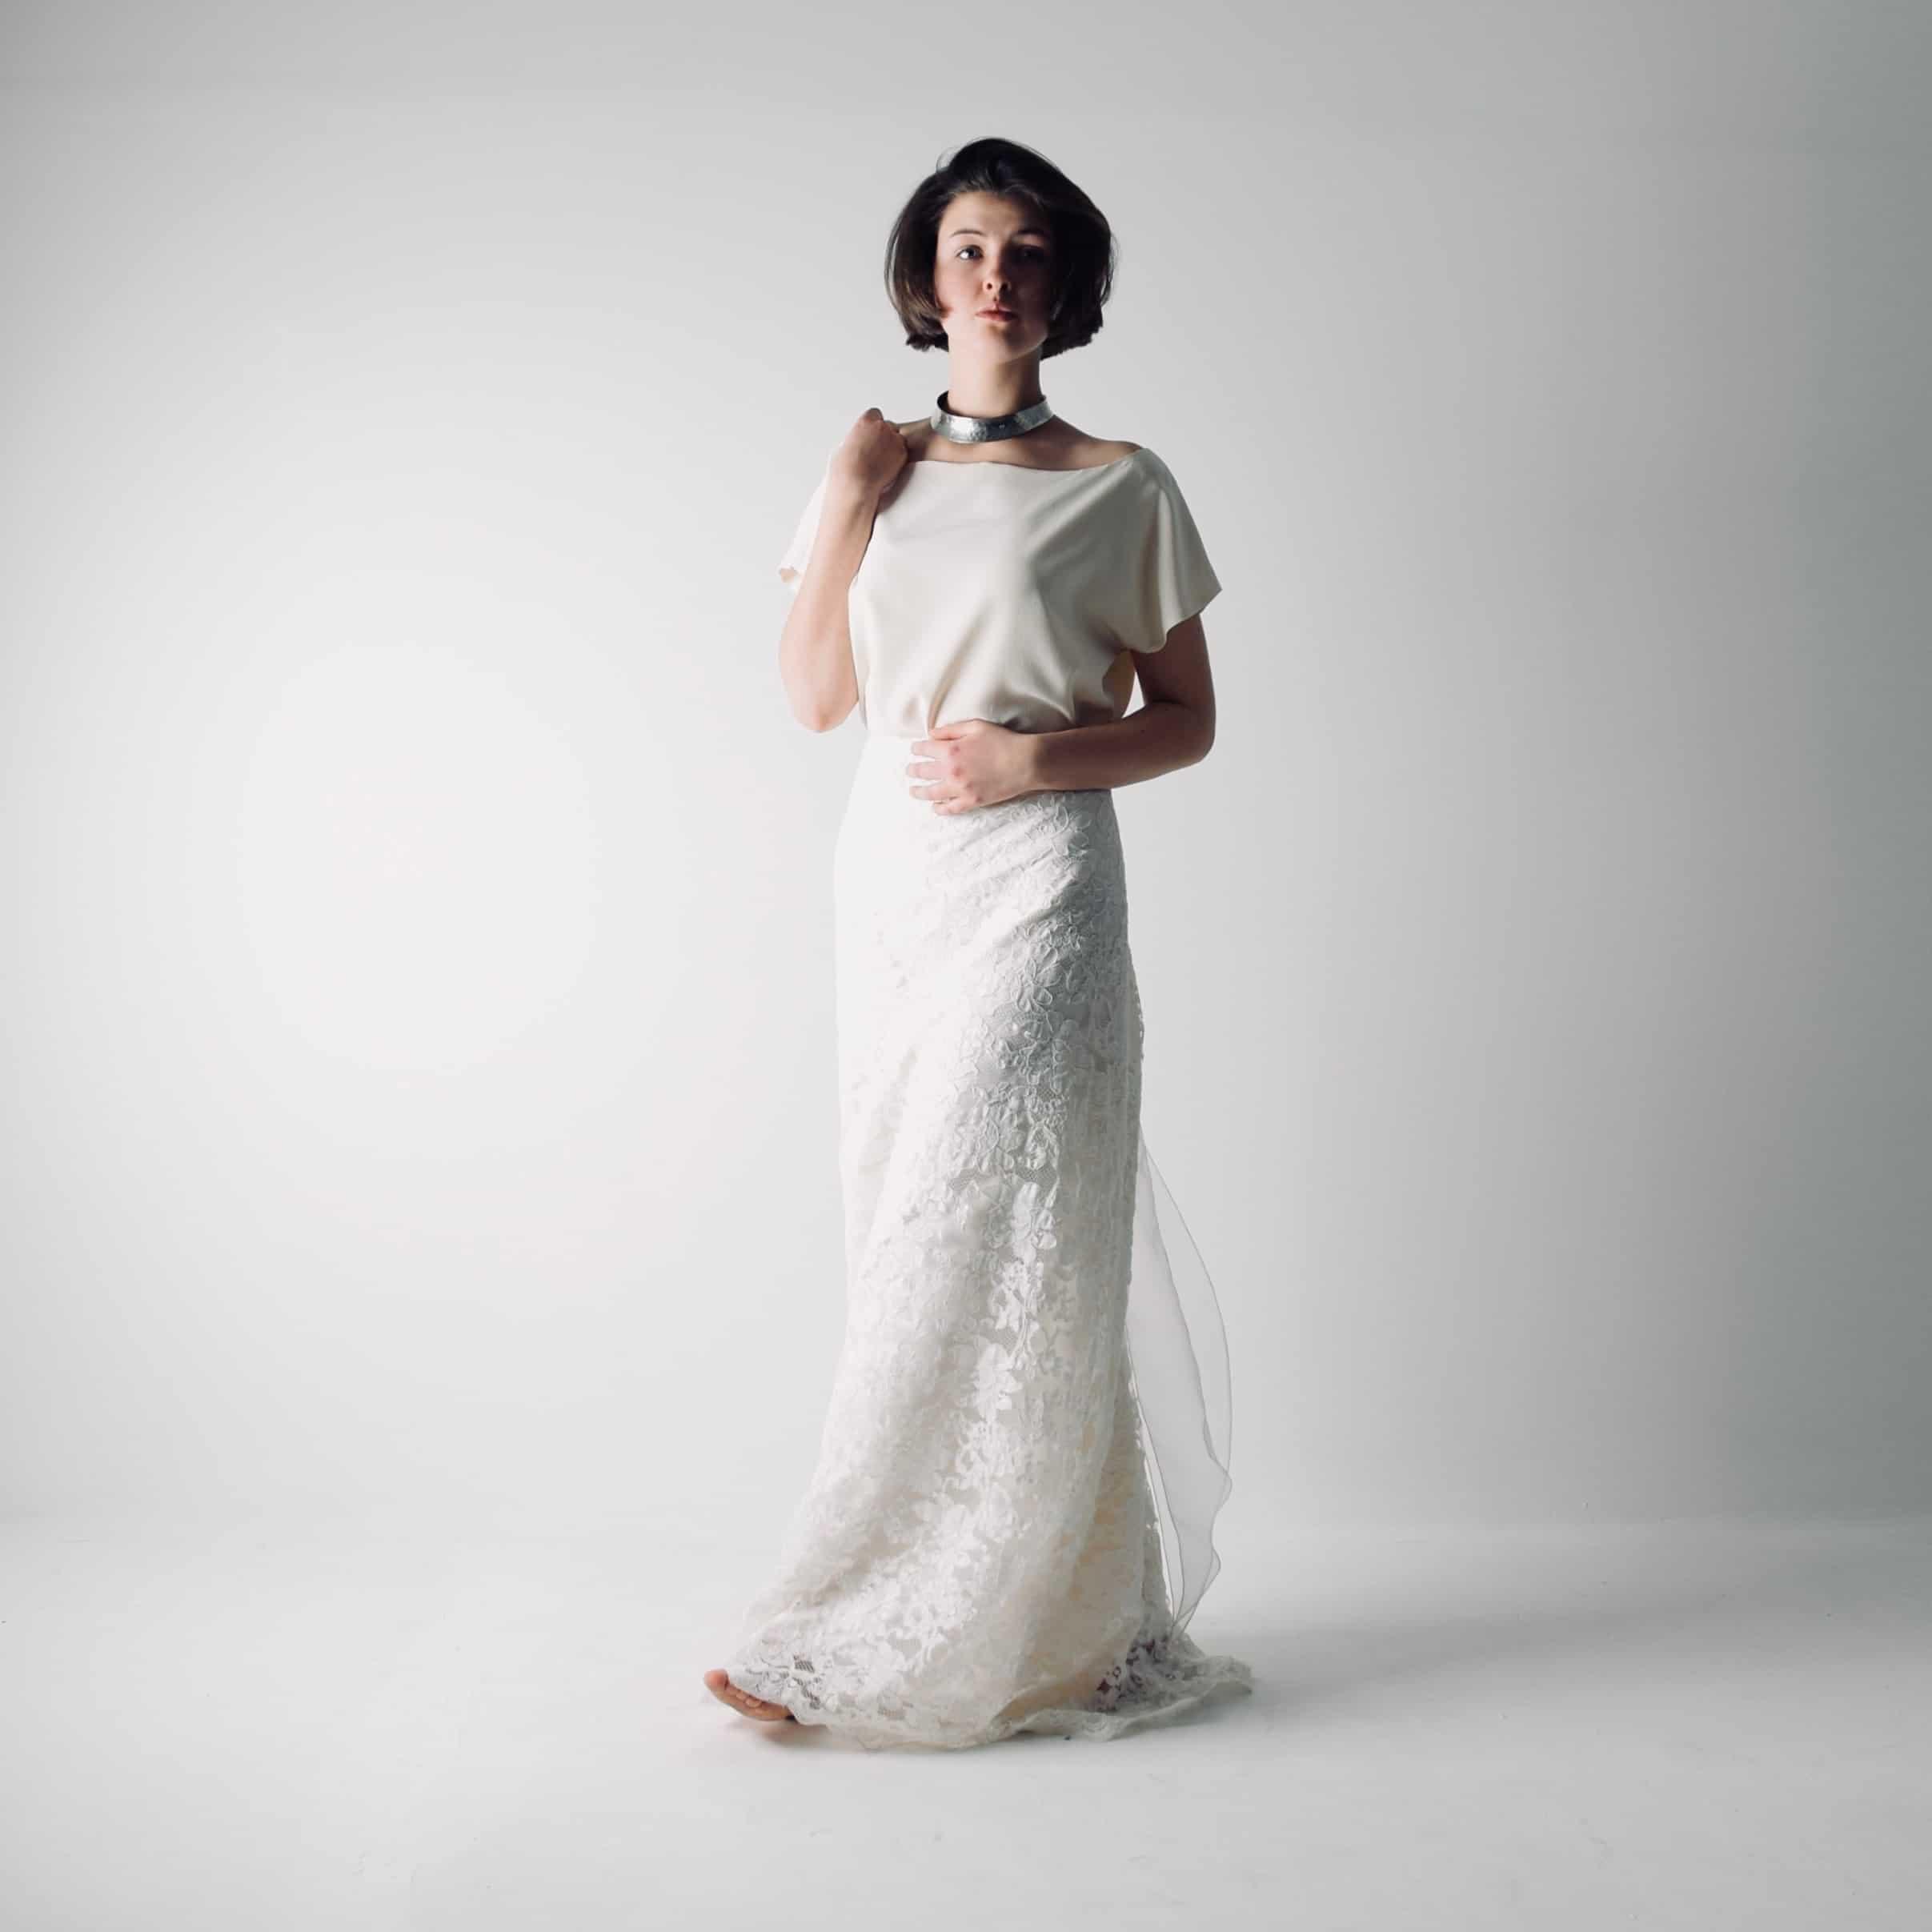 Silk Wedding Dress.Foxglove Boho Lace Bridal Separates